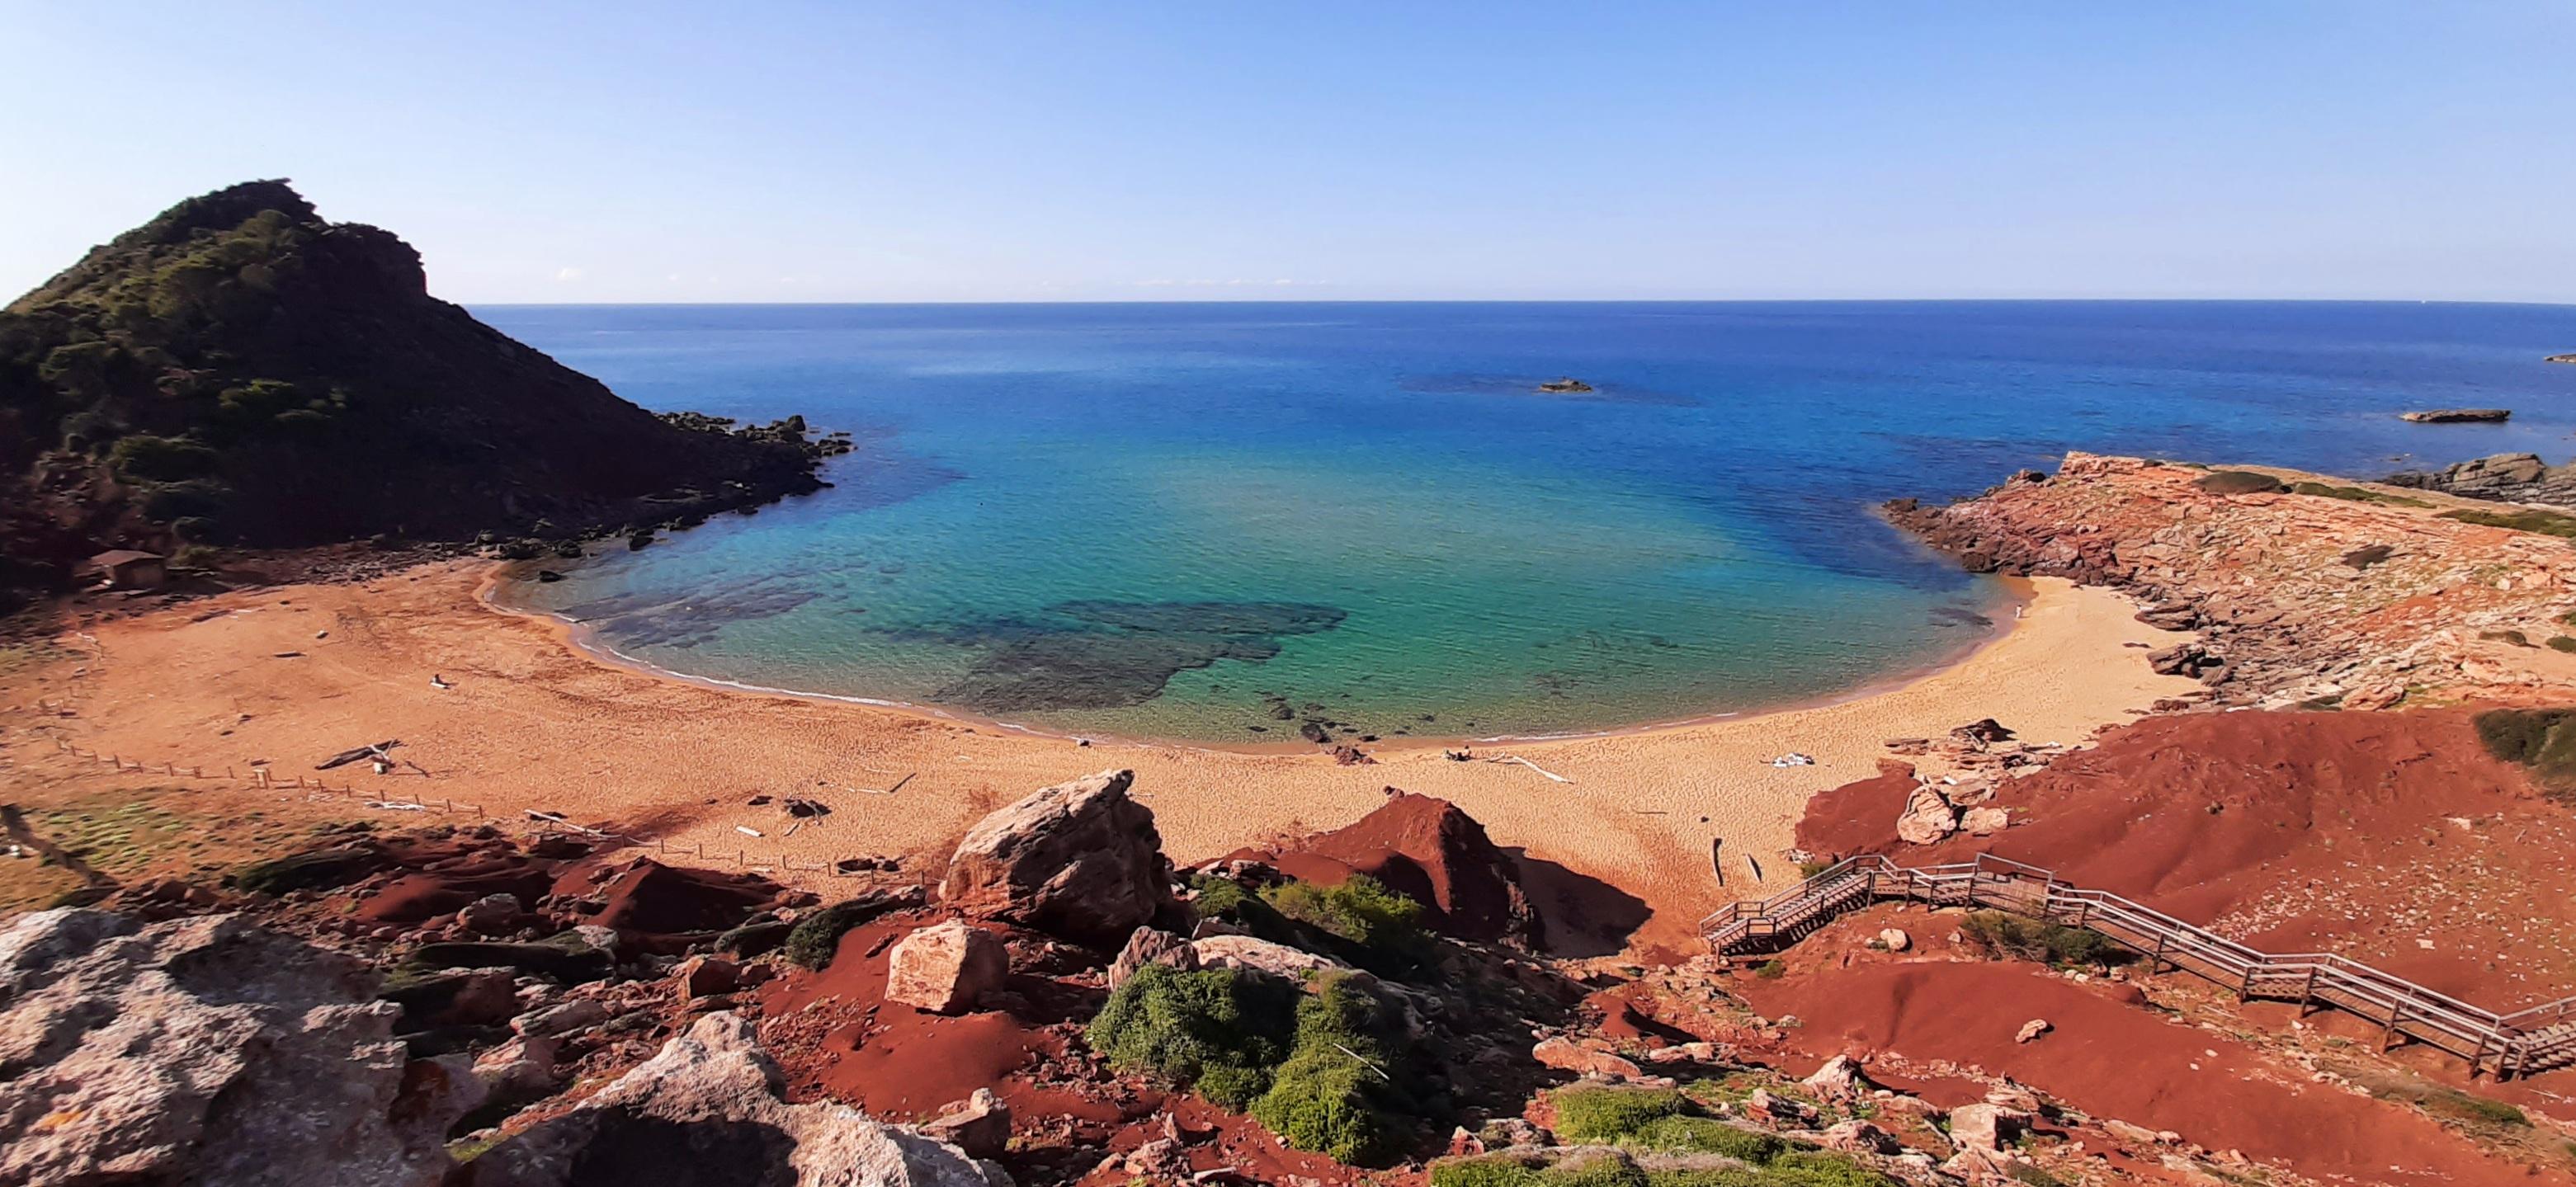 Cala El Pilar, Menorca, 5 mayo 2021